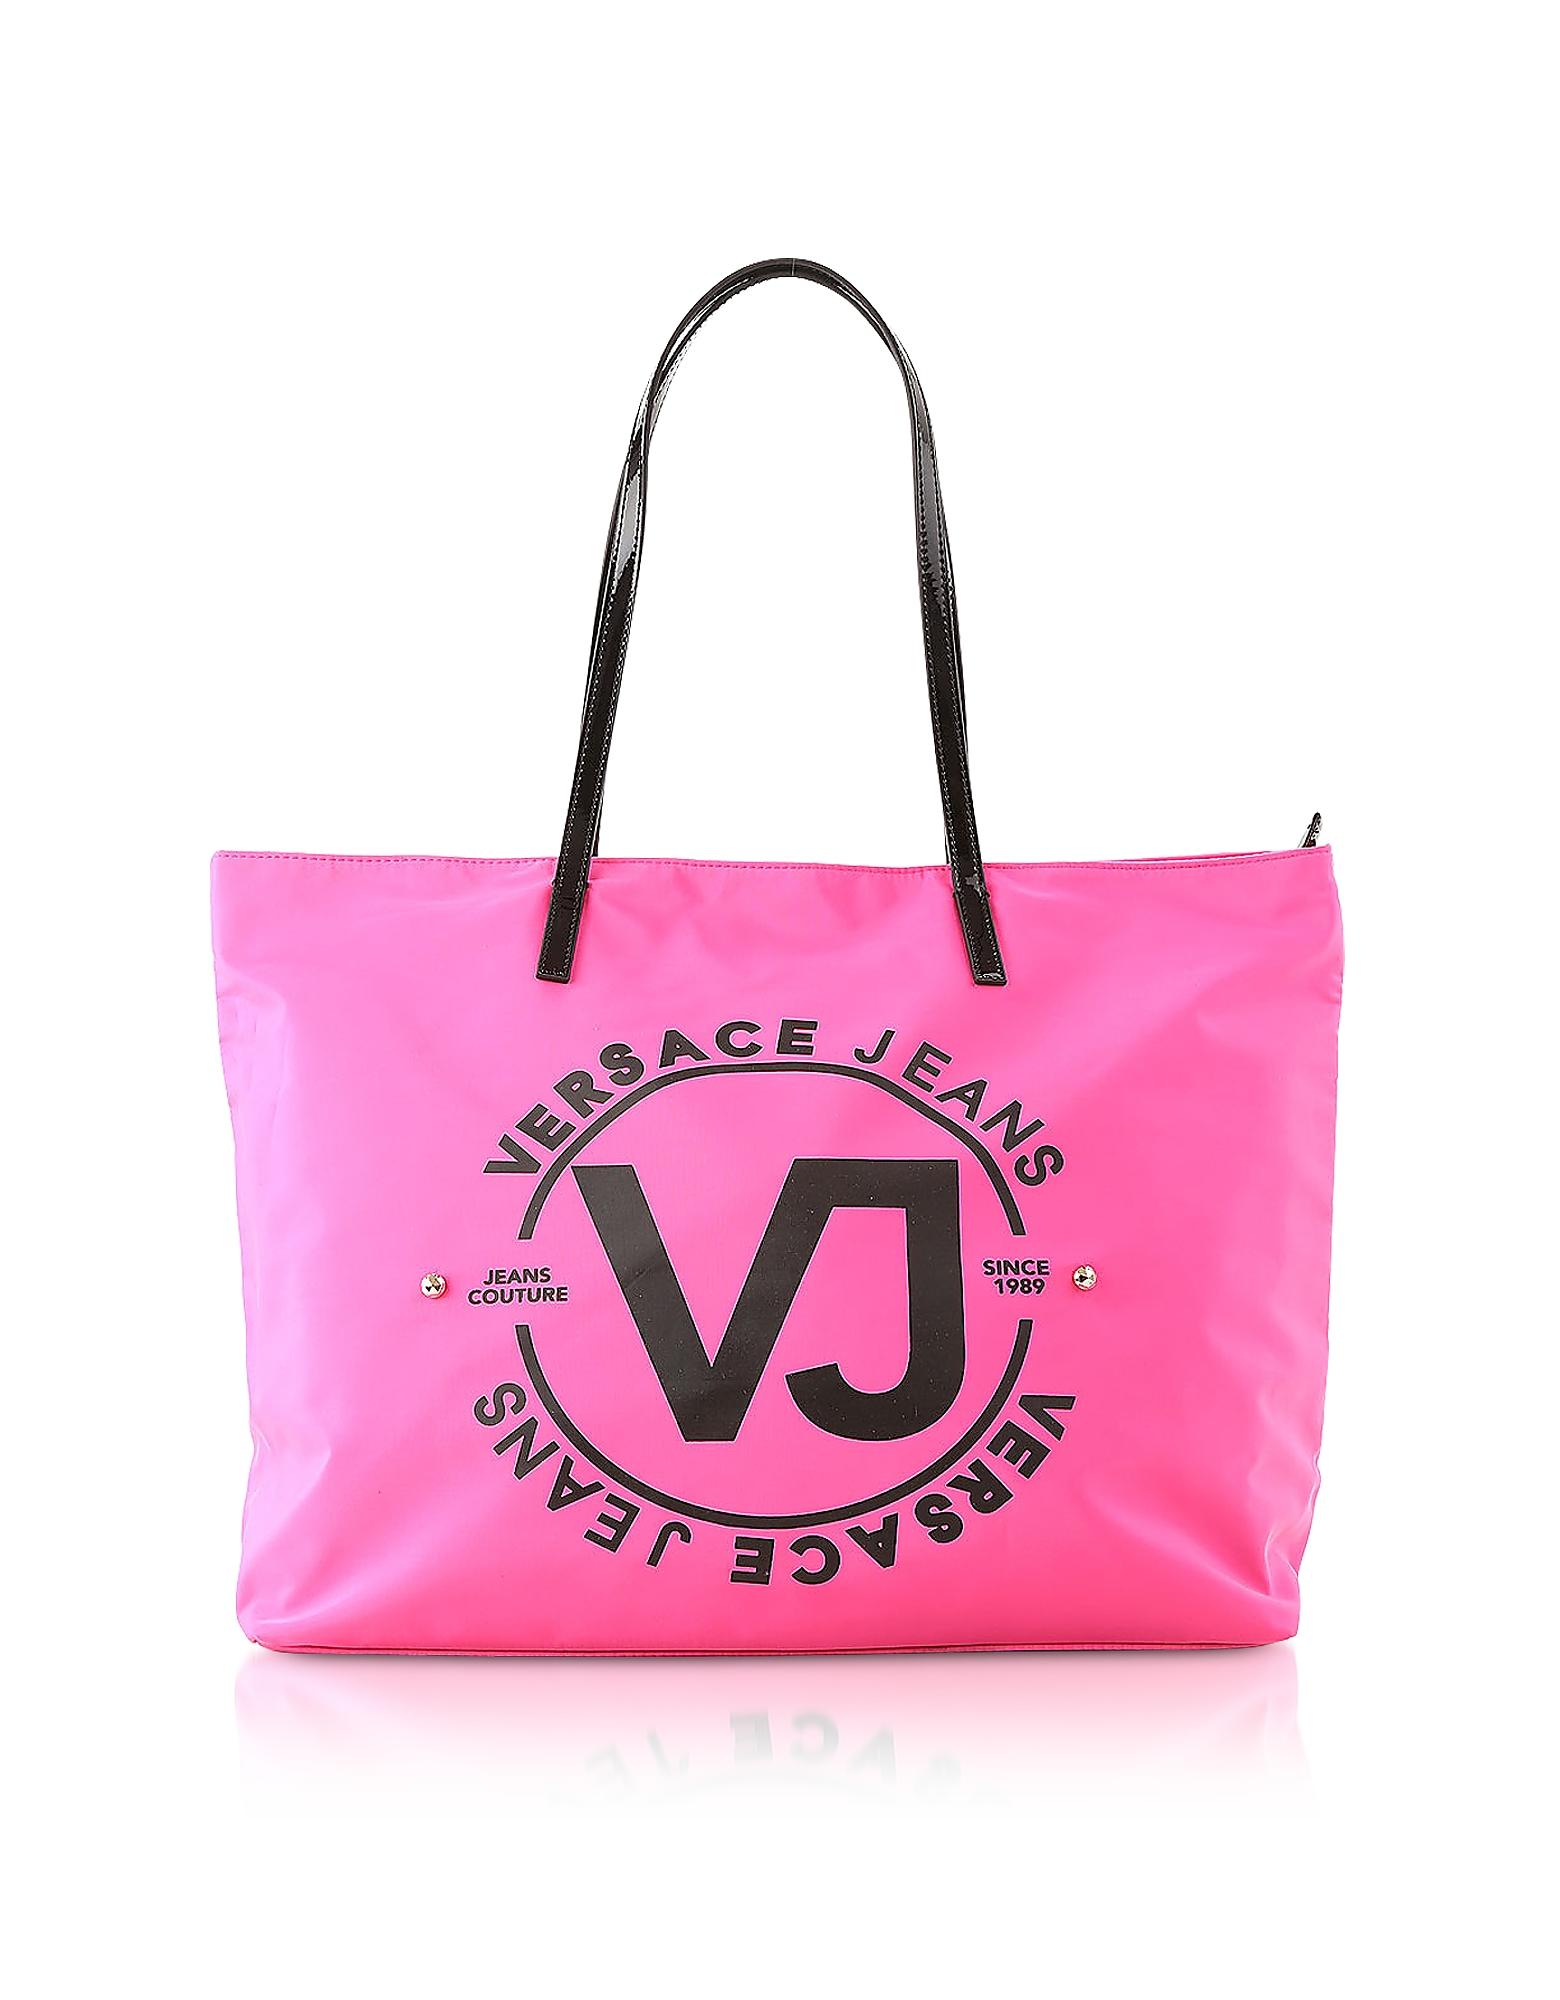 Versace Jeans Designer Handbags, 6 Dis. 60 Fuchsia Polyester Tote Bag